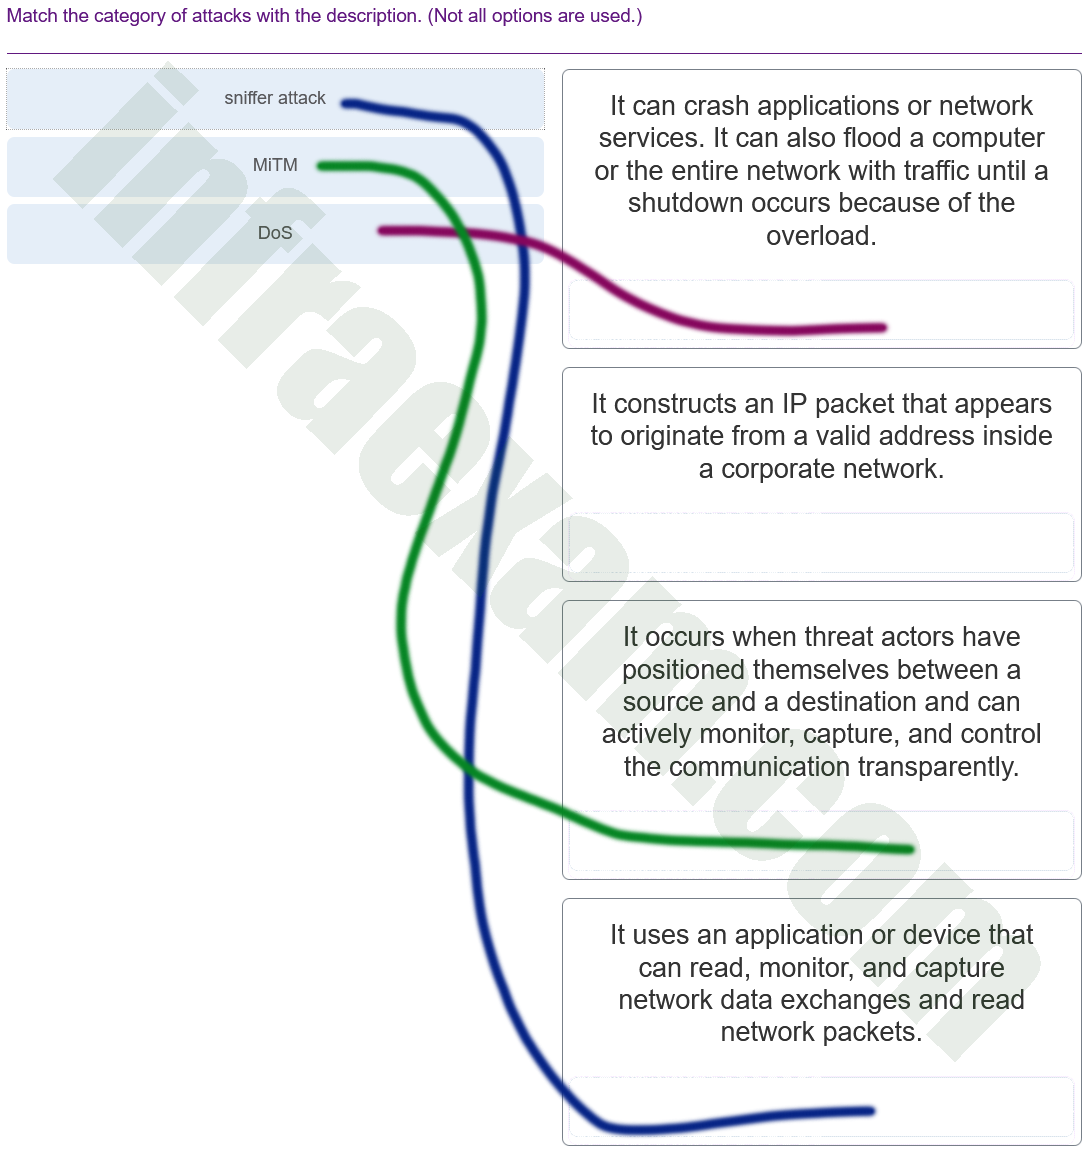 CyberOps Associate (Version 1.0) - CyberOps Associate 1.0 Final exam Answers 006